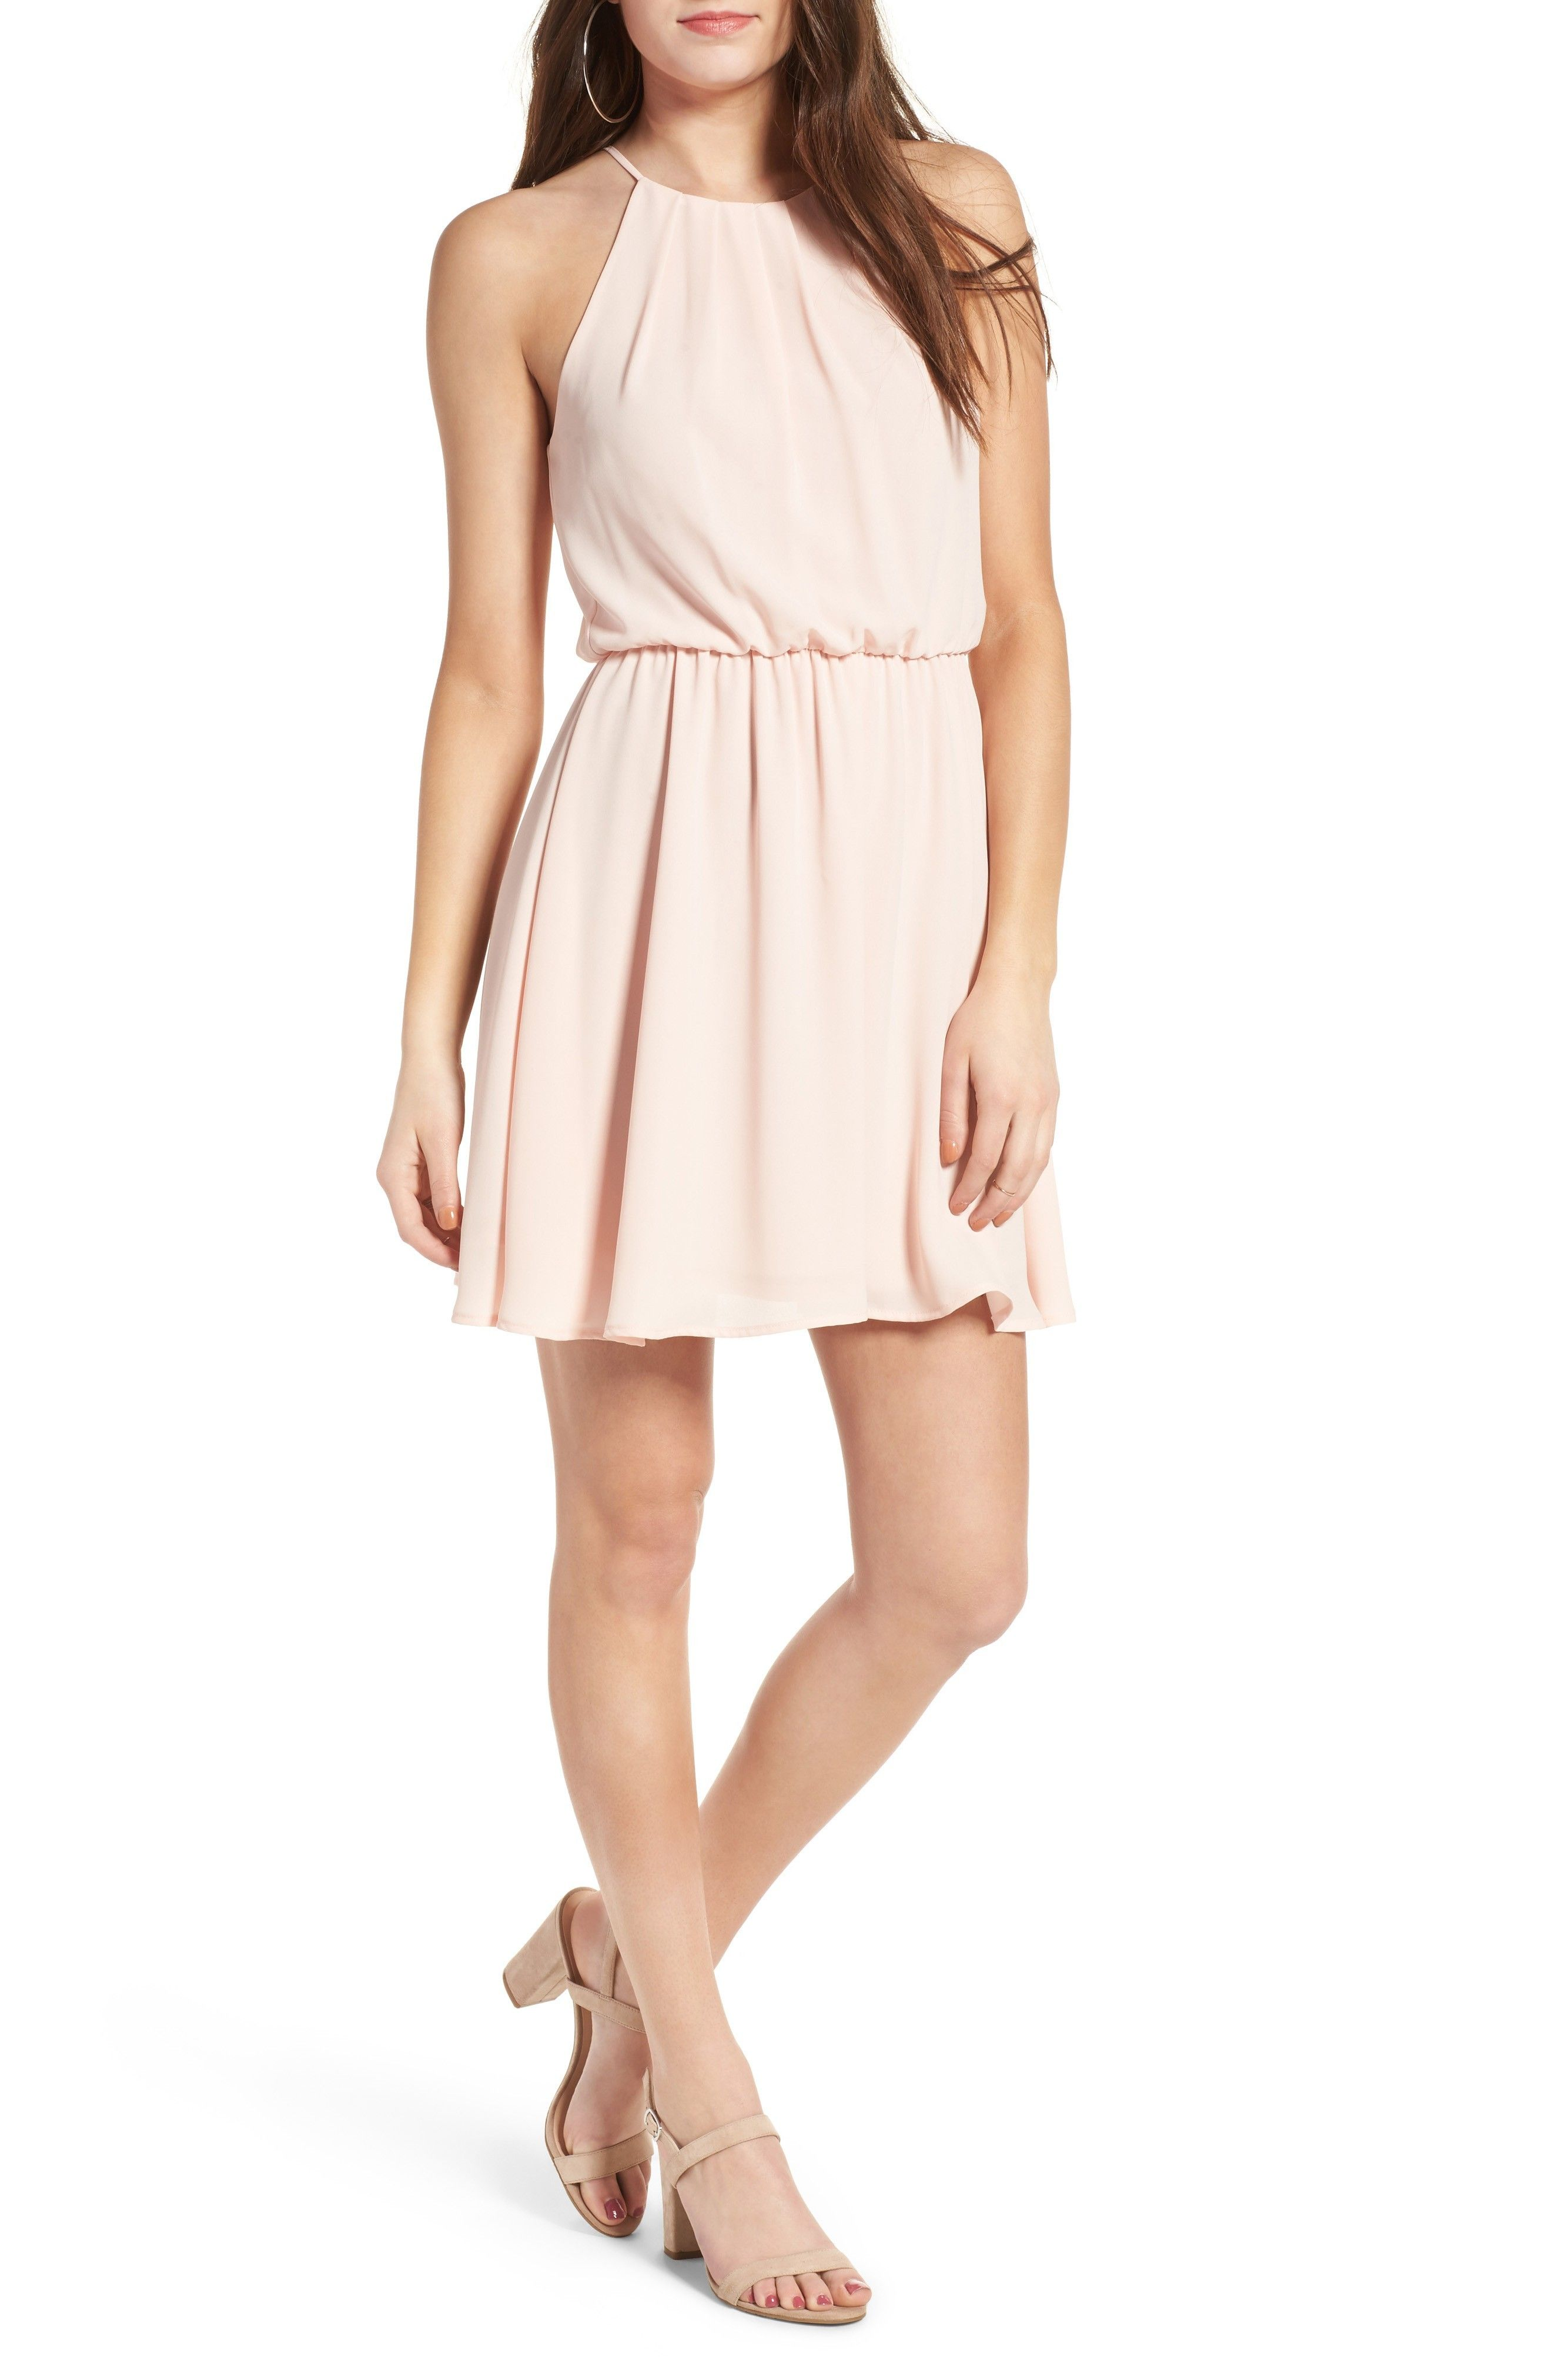 Blouson Chiffon Skater Dress pink from nordstrom lush   Since I\'m ...